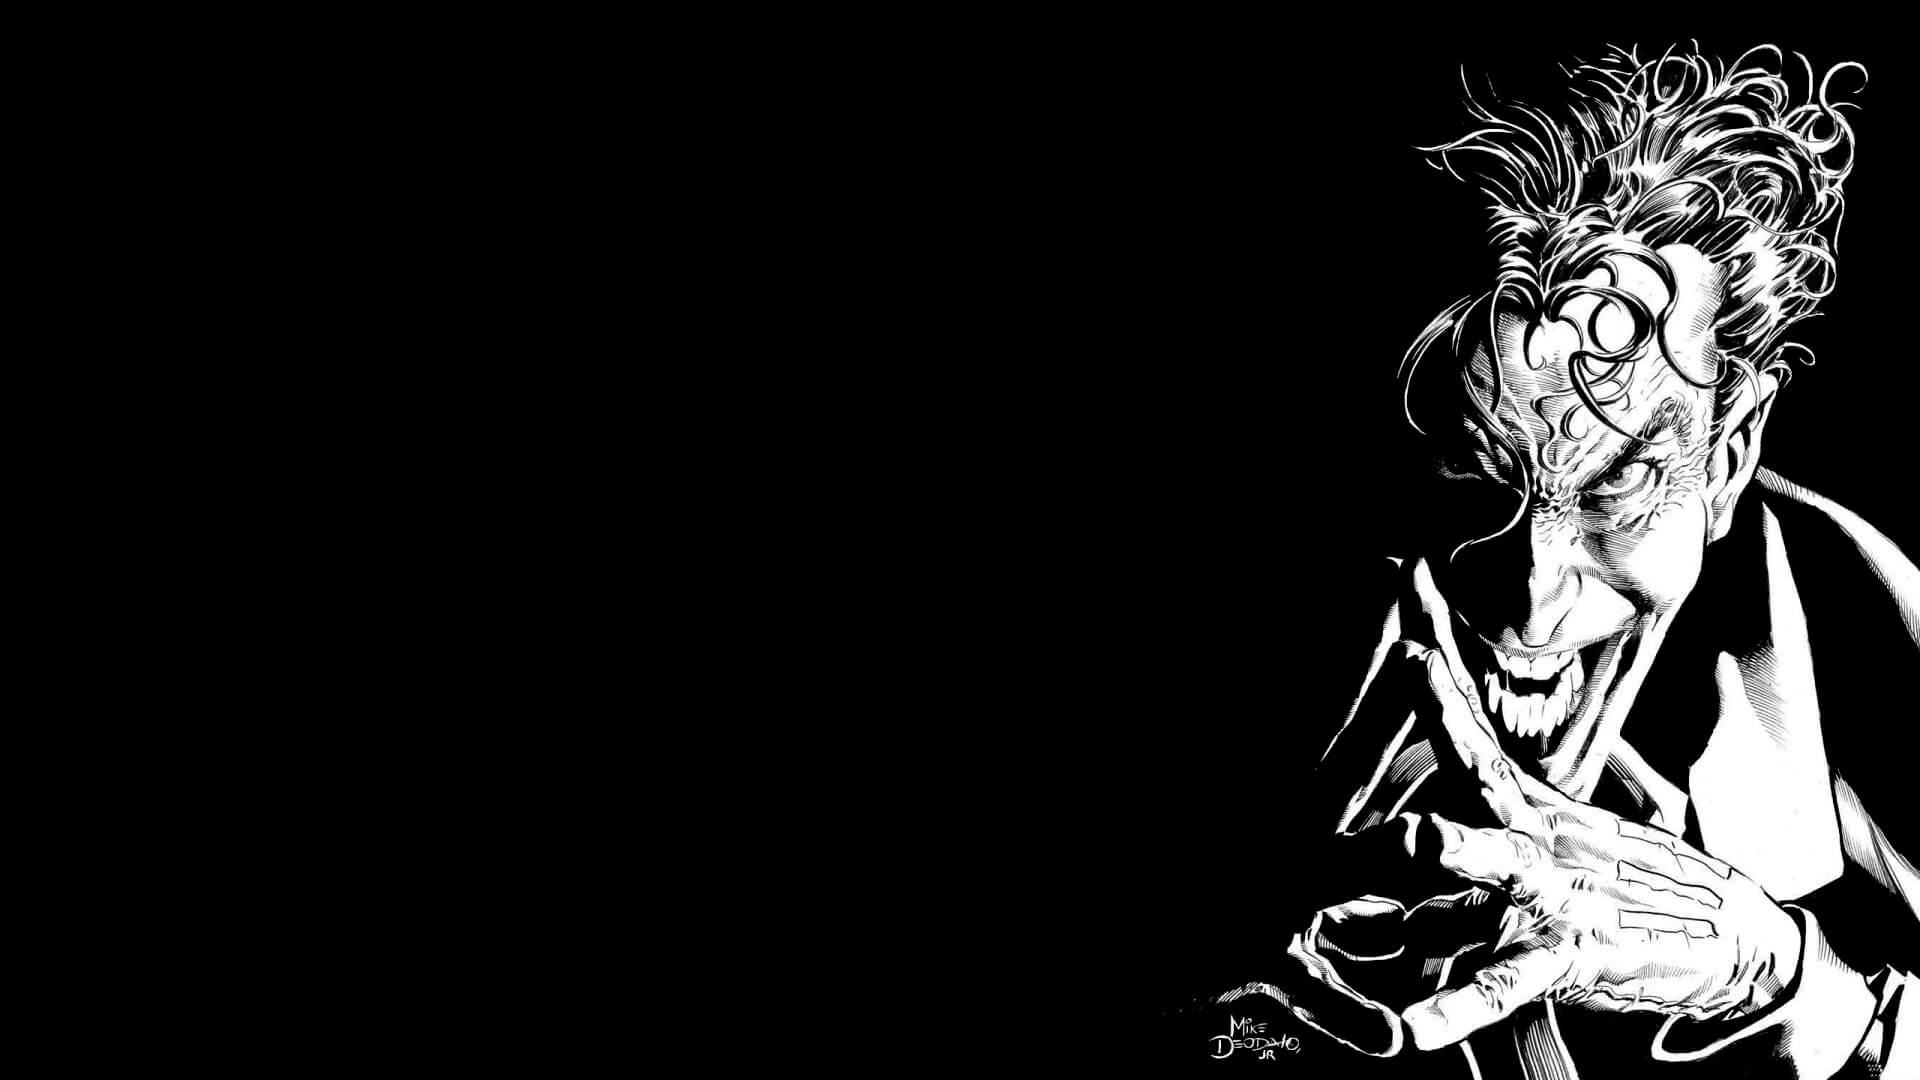 1920x1080 Black & white joker HD wallpaper